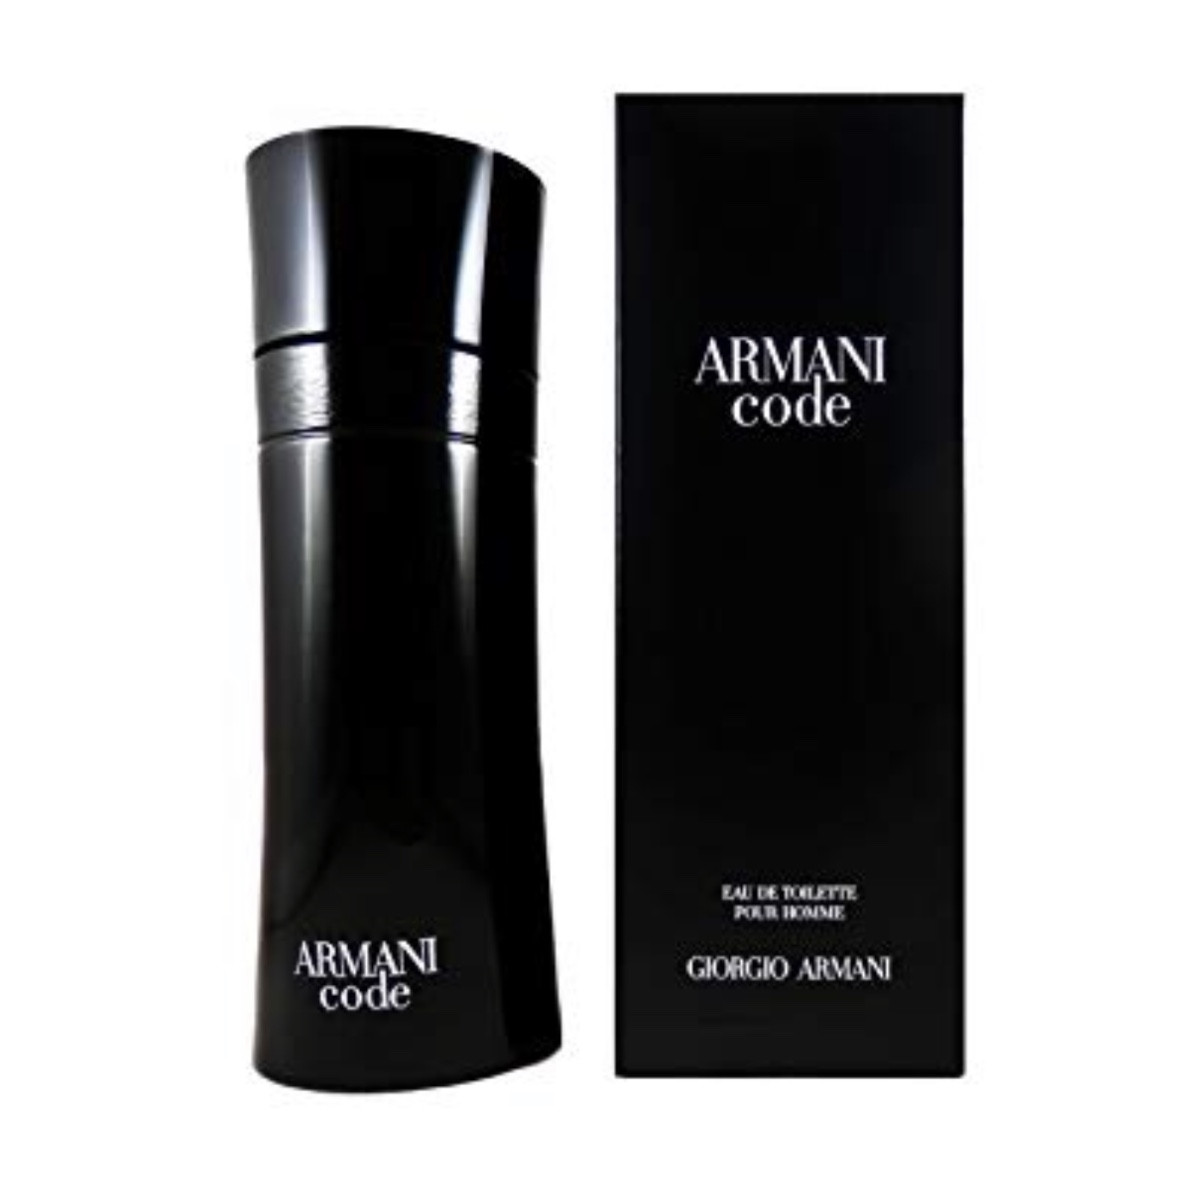 Giorgio Armani Code Pour Homme Туалетная вода 125 ml ( Джорджио Армани Код Пур Хом )